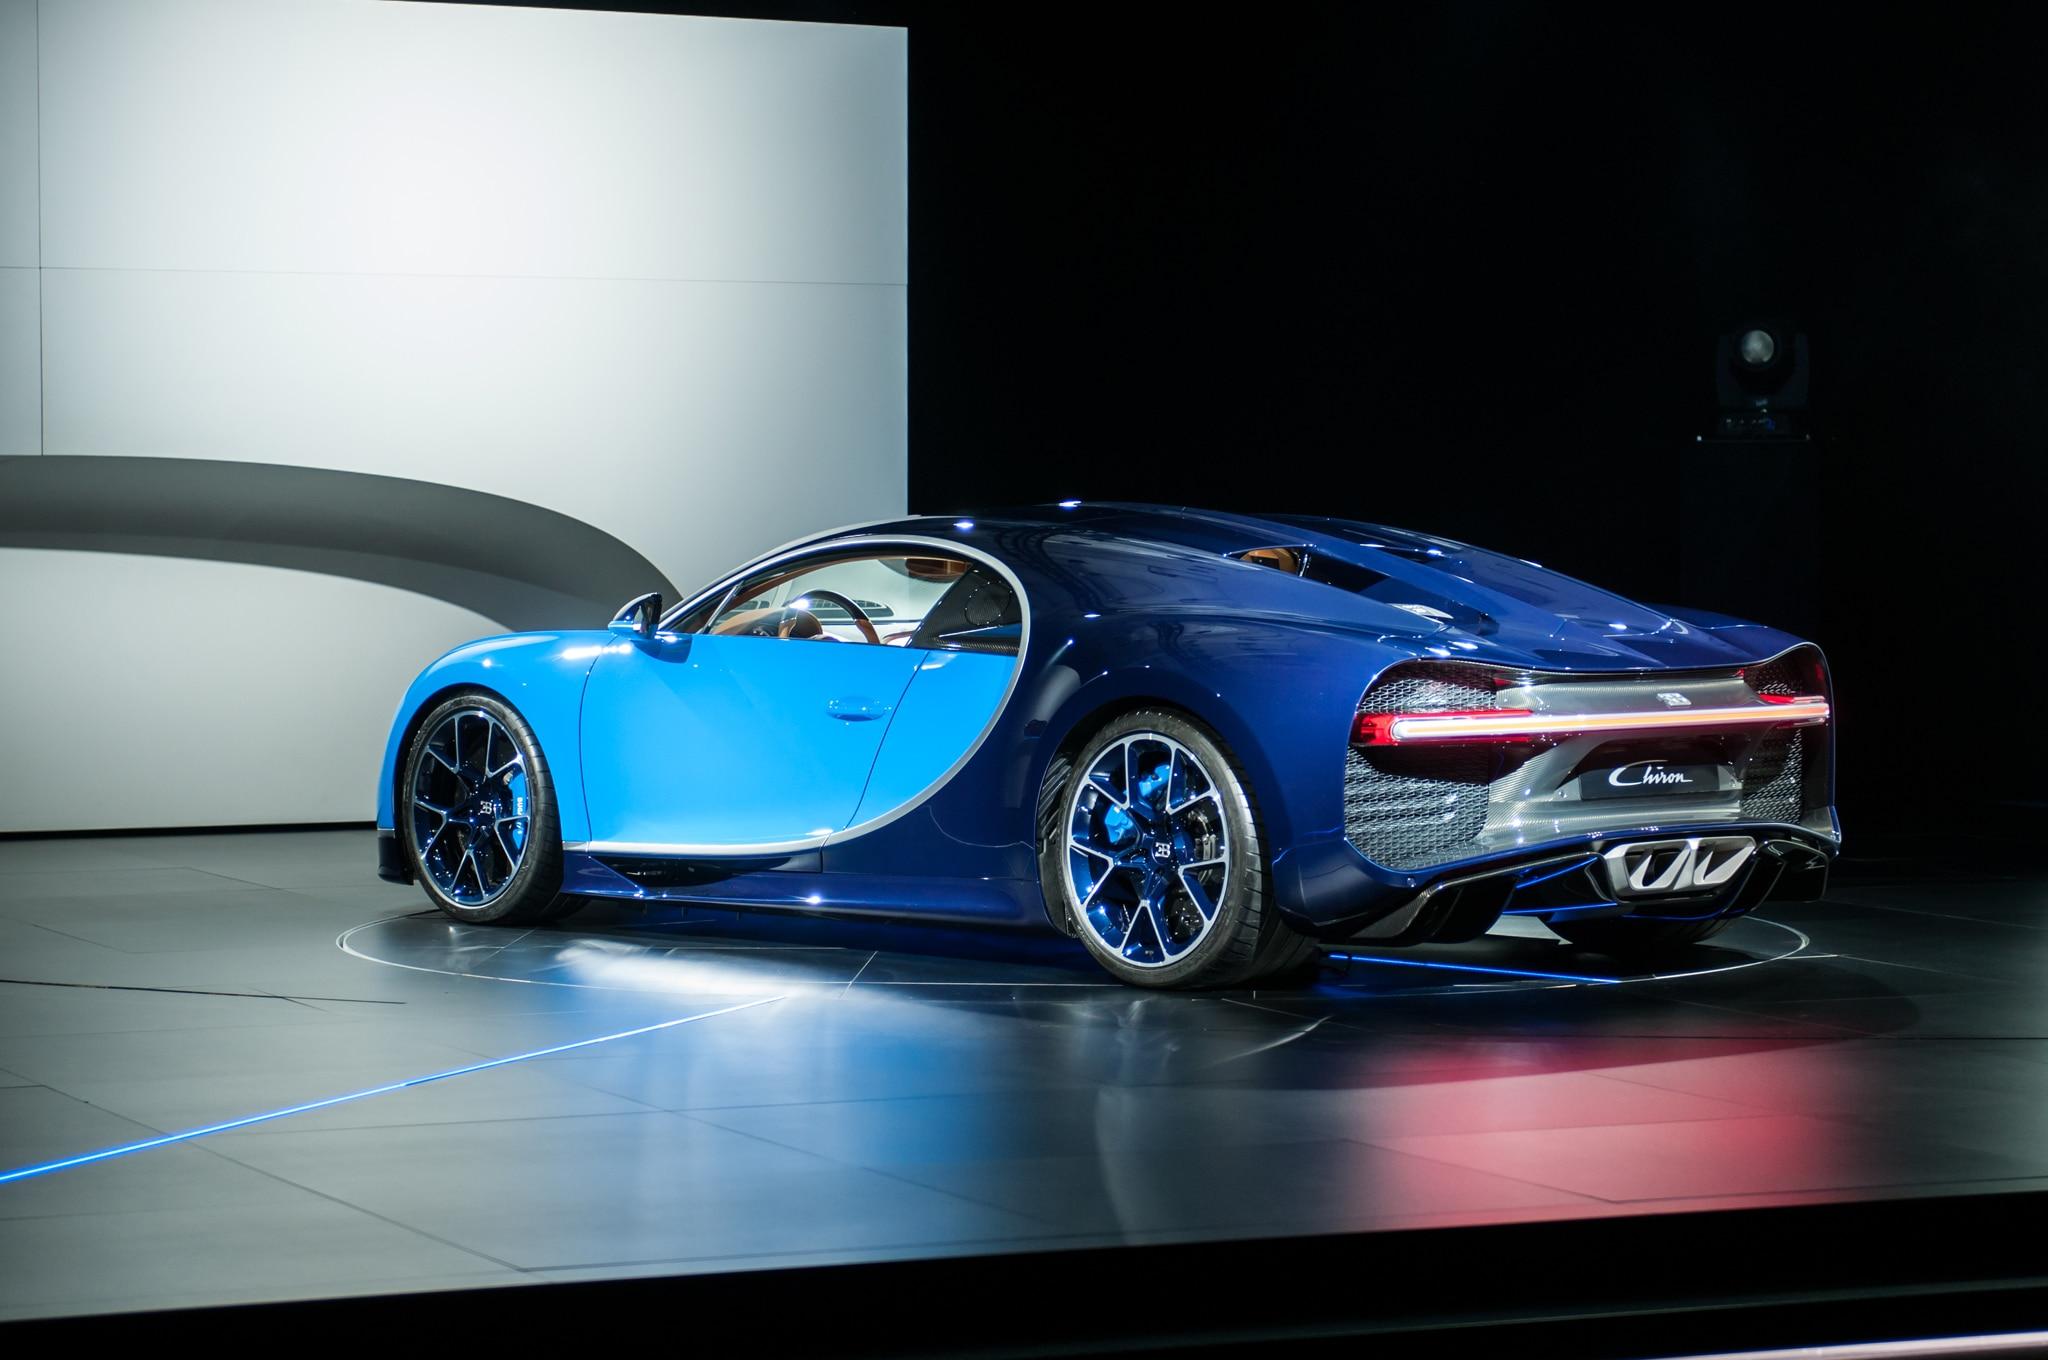 2017-Bugatti-Chiron-rear-three-quarter-02 Cozy Bugatti Veyron and Chiron Difference Cars Trend